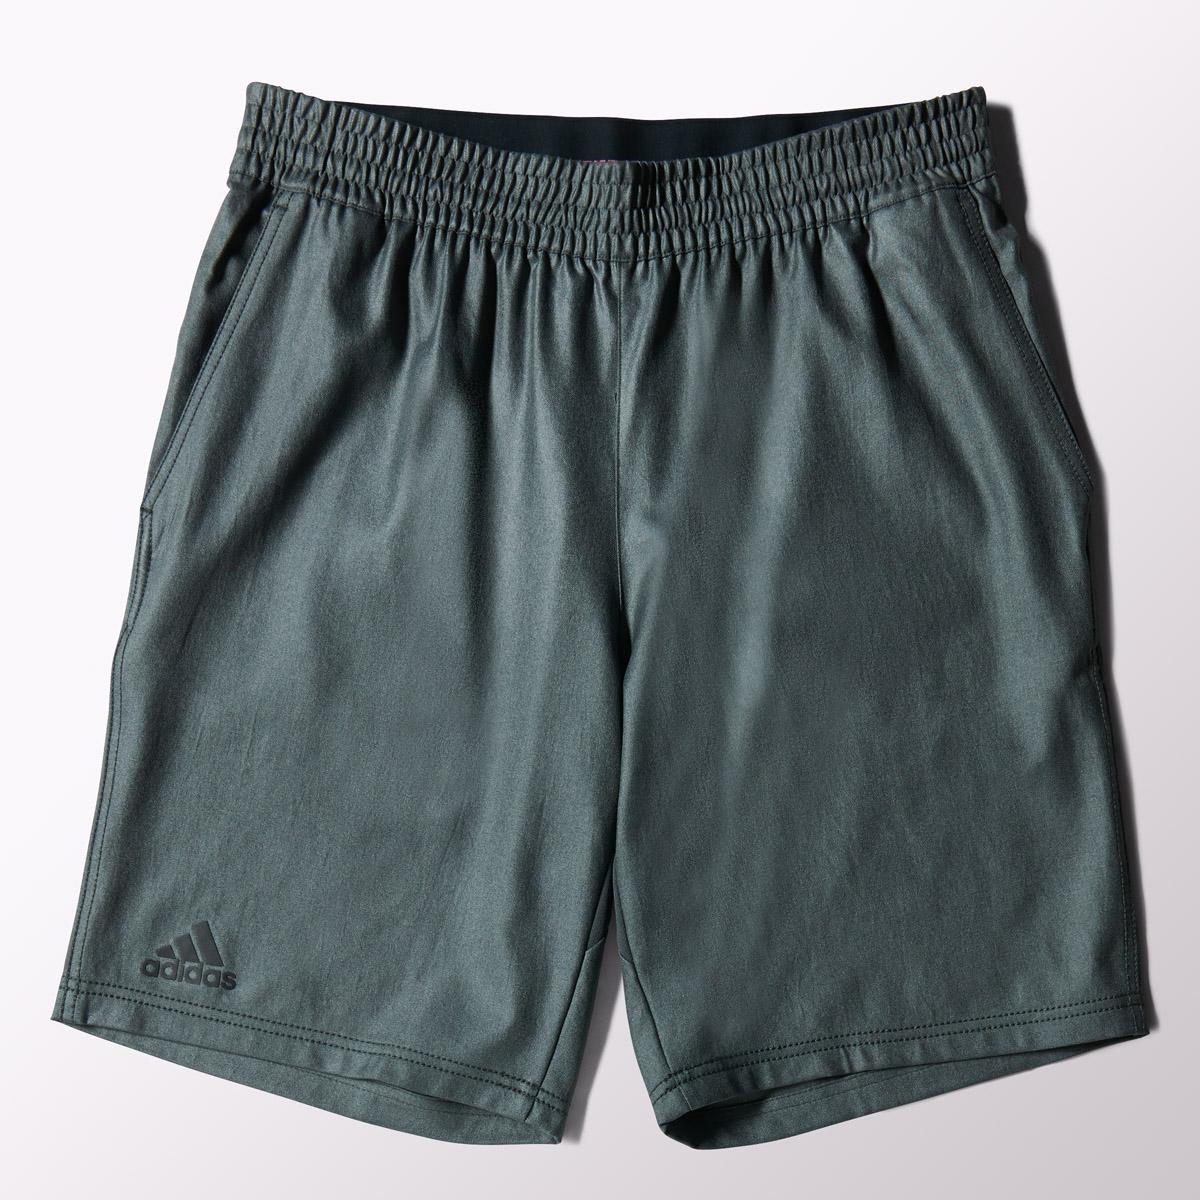 Adidas Mens Adizero Bermuda Shorts - Solid Grey/Gun Metal